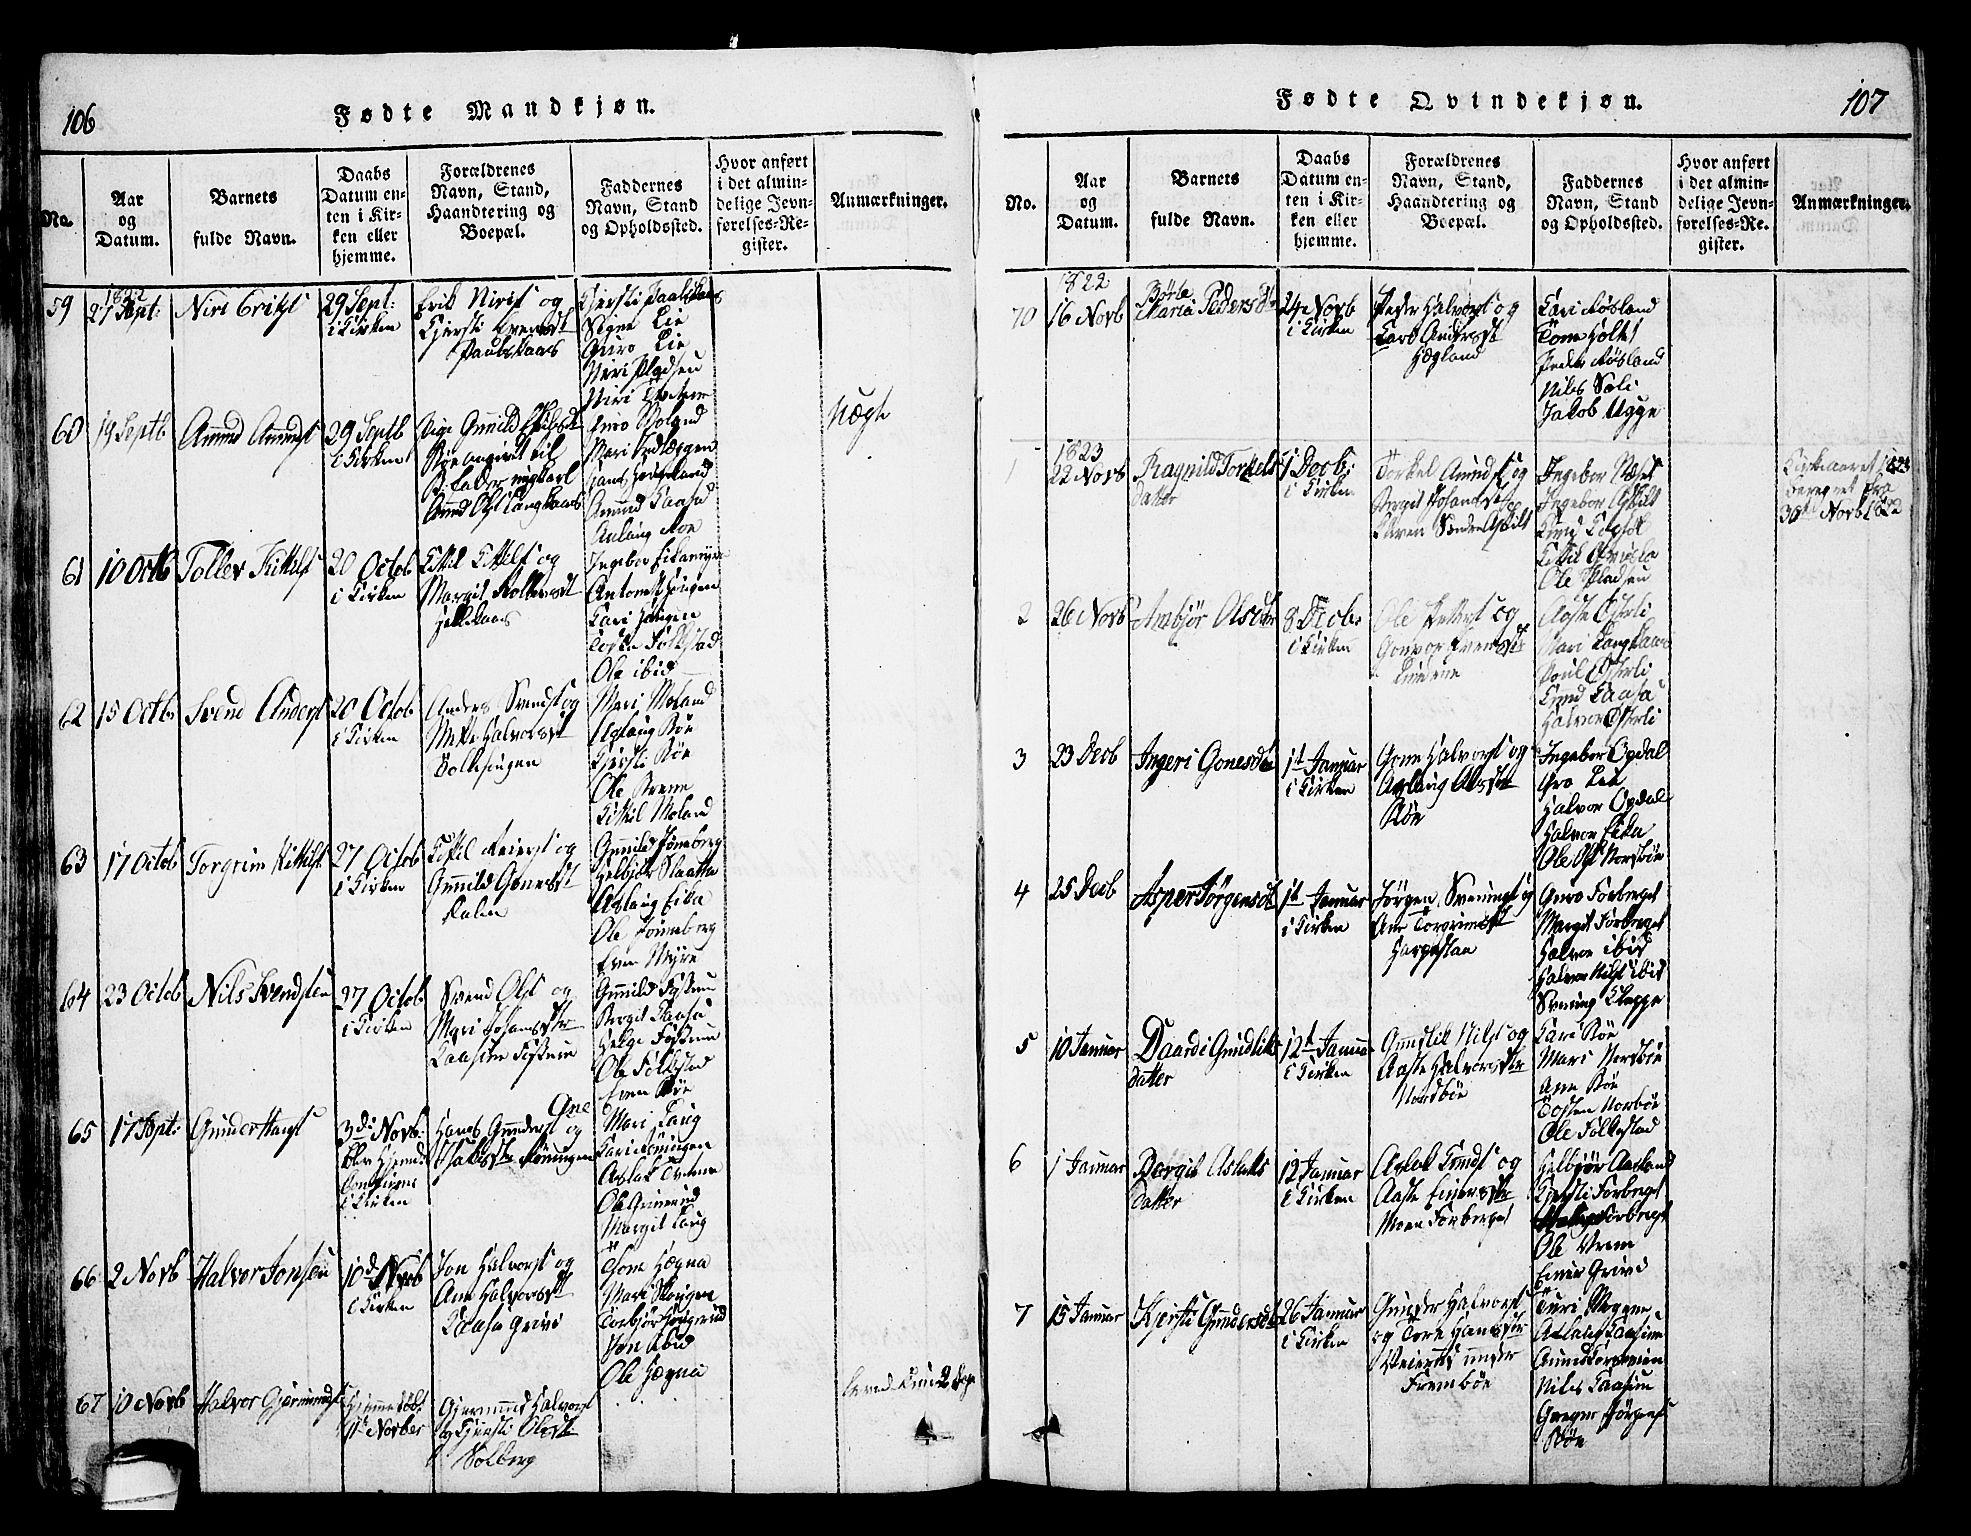 SAKO, Bø kirkebøker, G/Ga/L0001: Klokkerbok nr. 1, 1815-1831, s. 106-107